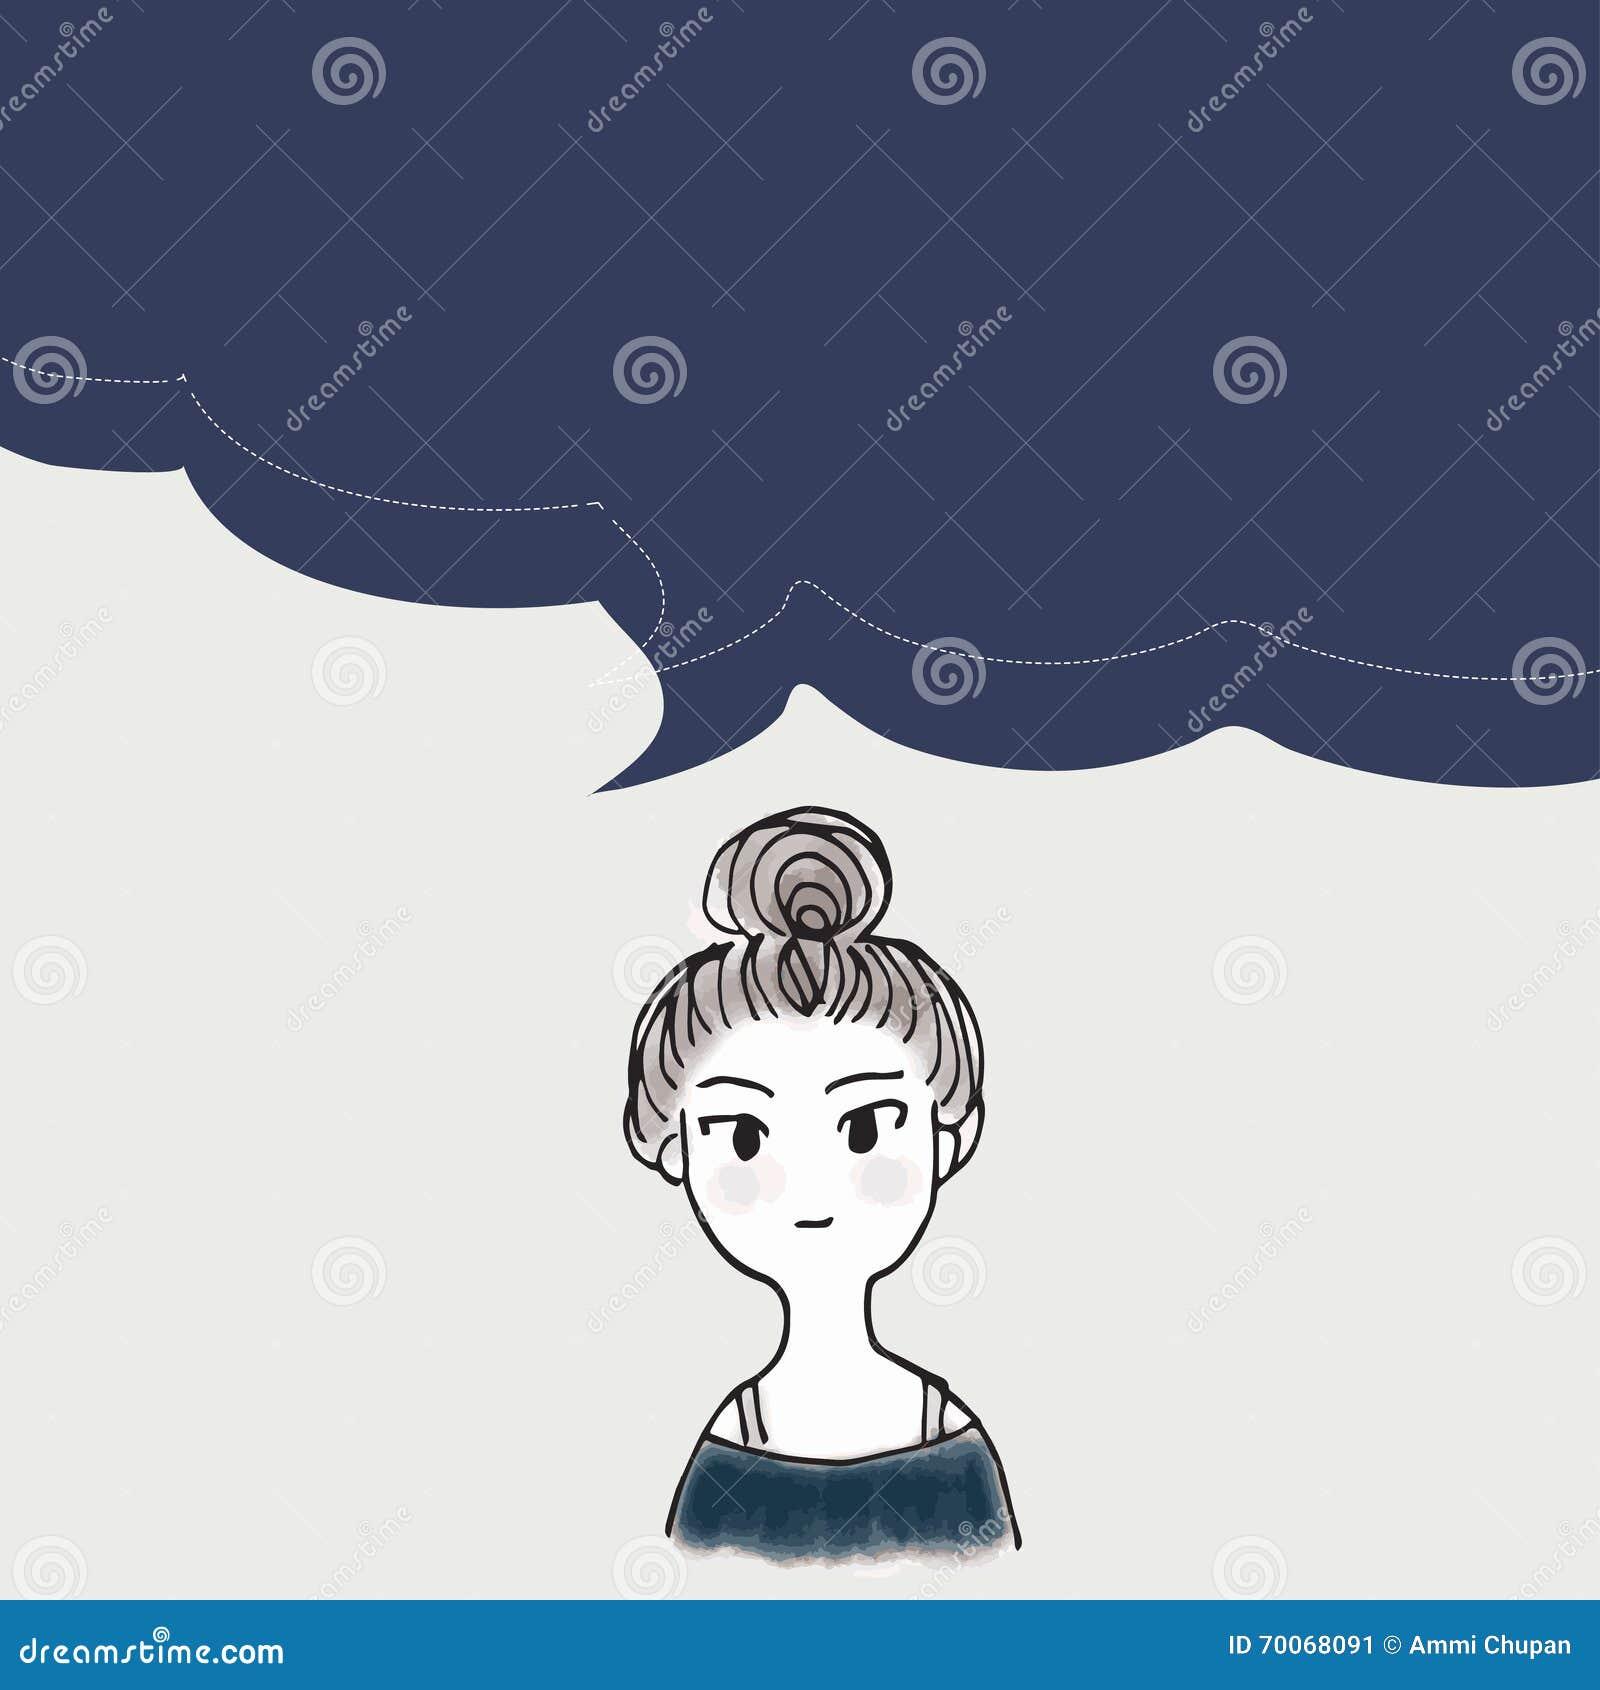 Cartoon Character Design Templates : Women cartoon characters with talking babble vector art